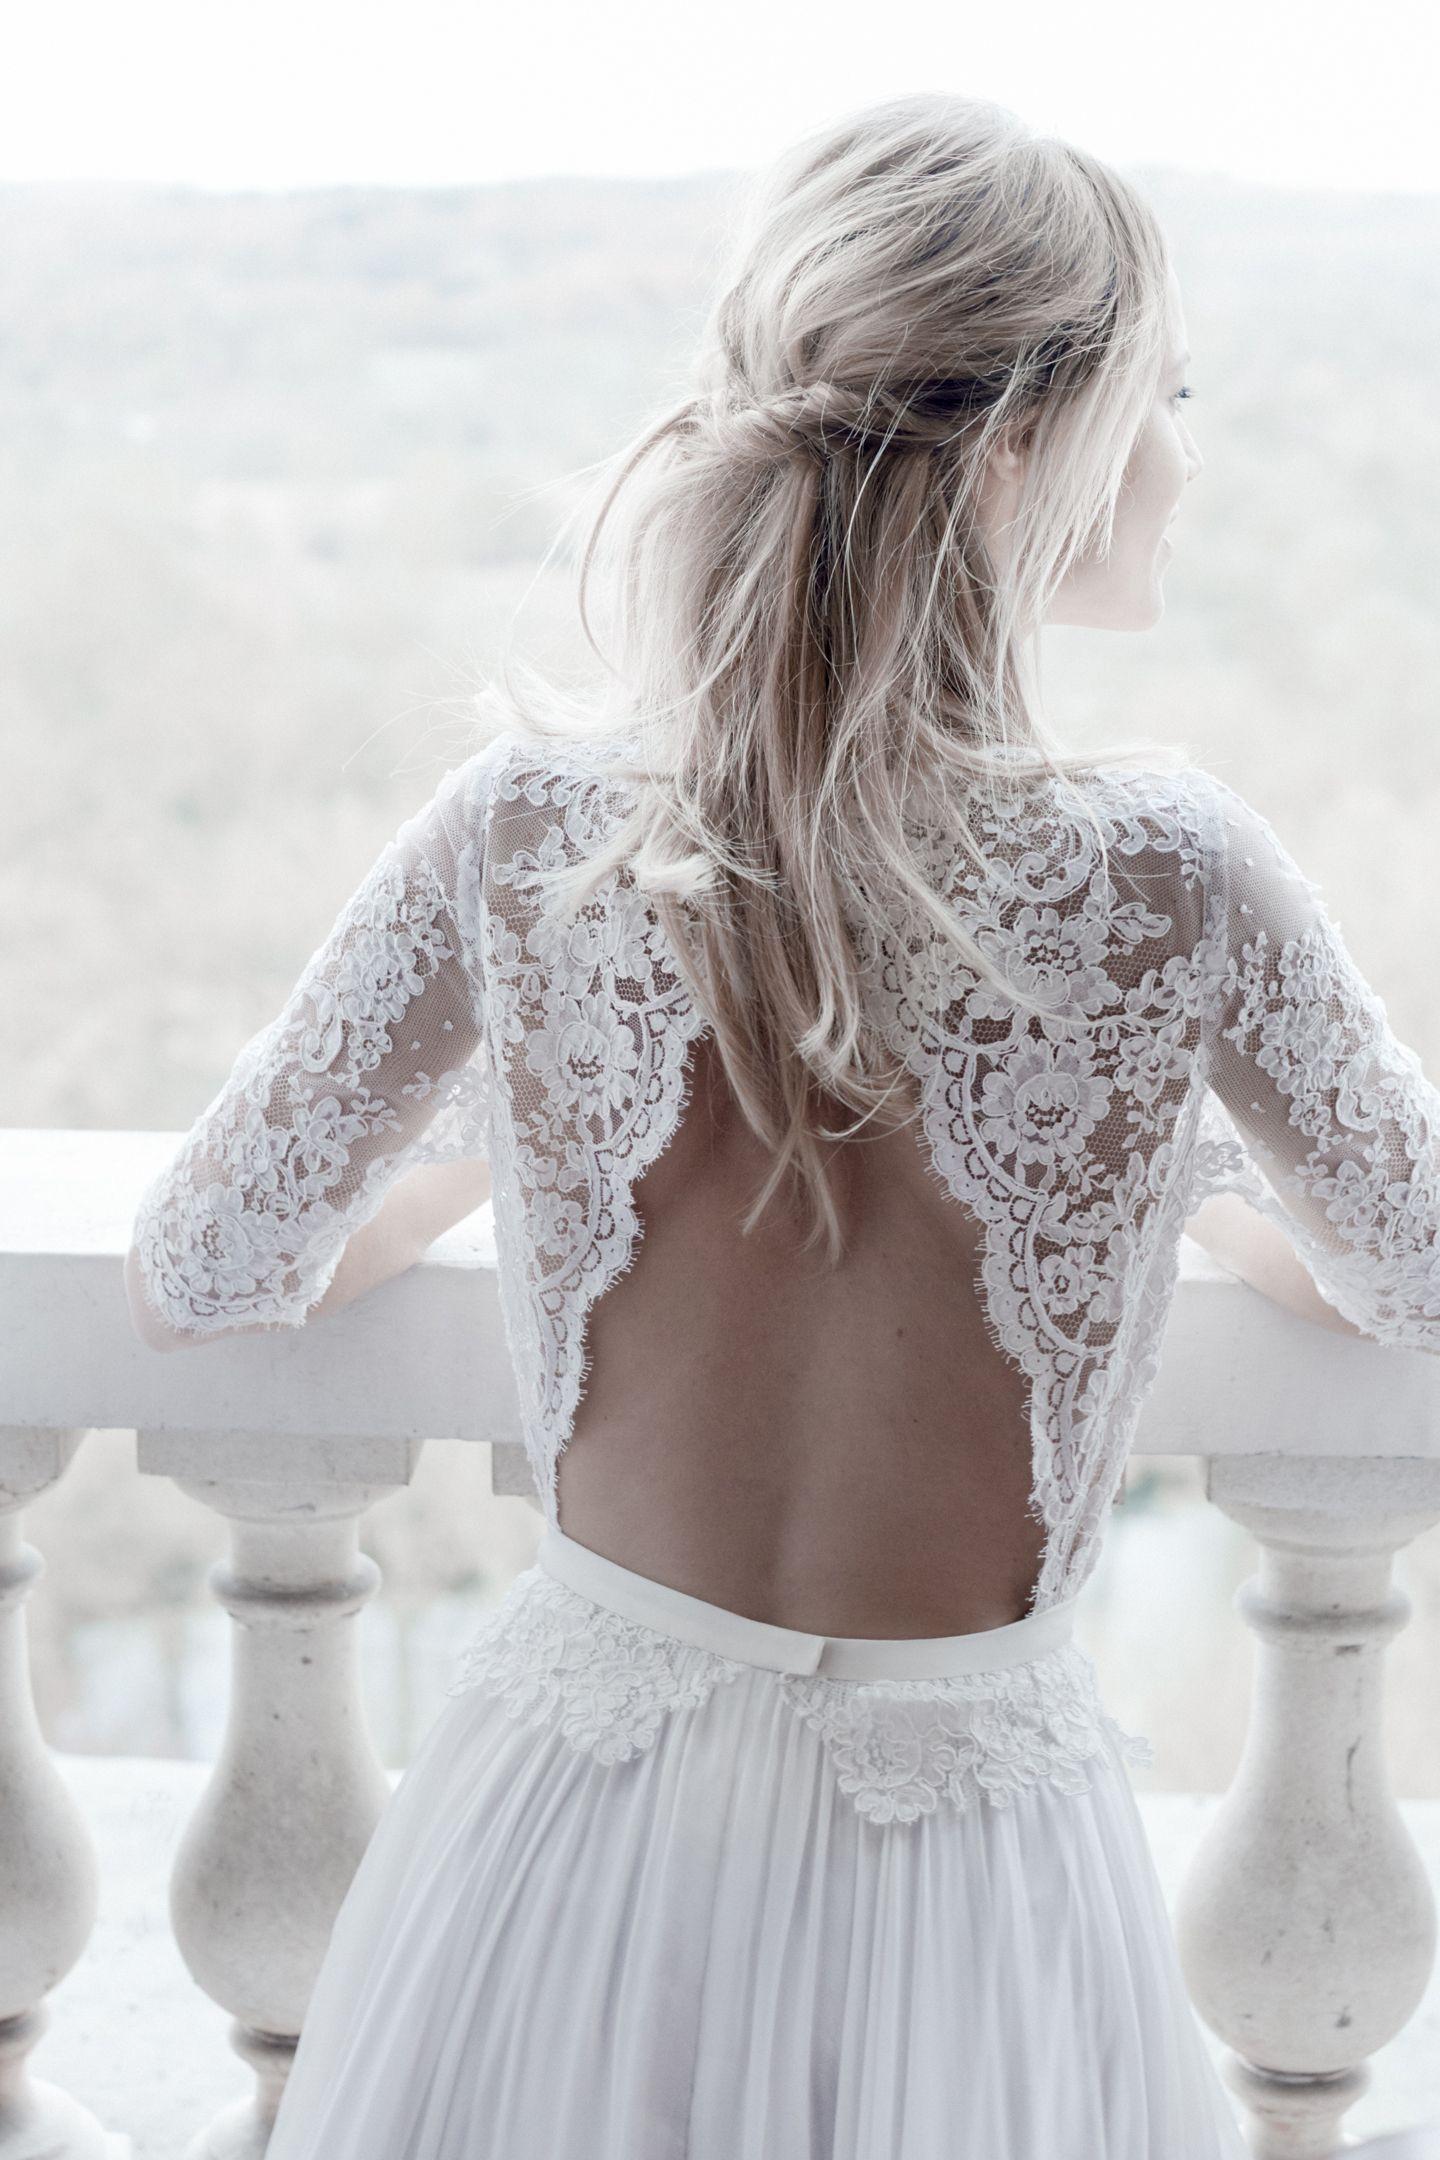 60 vestidos de novia con espaldas impresionantes : Album photo - enfemenino